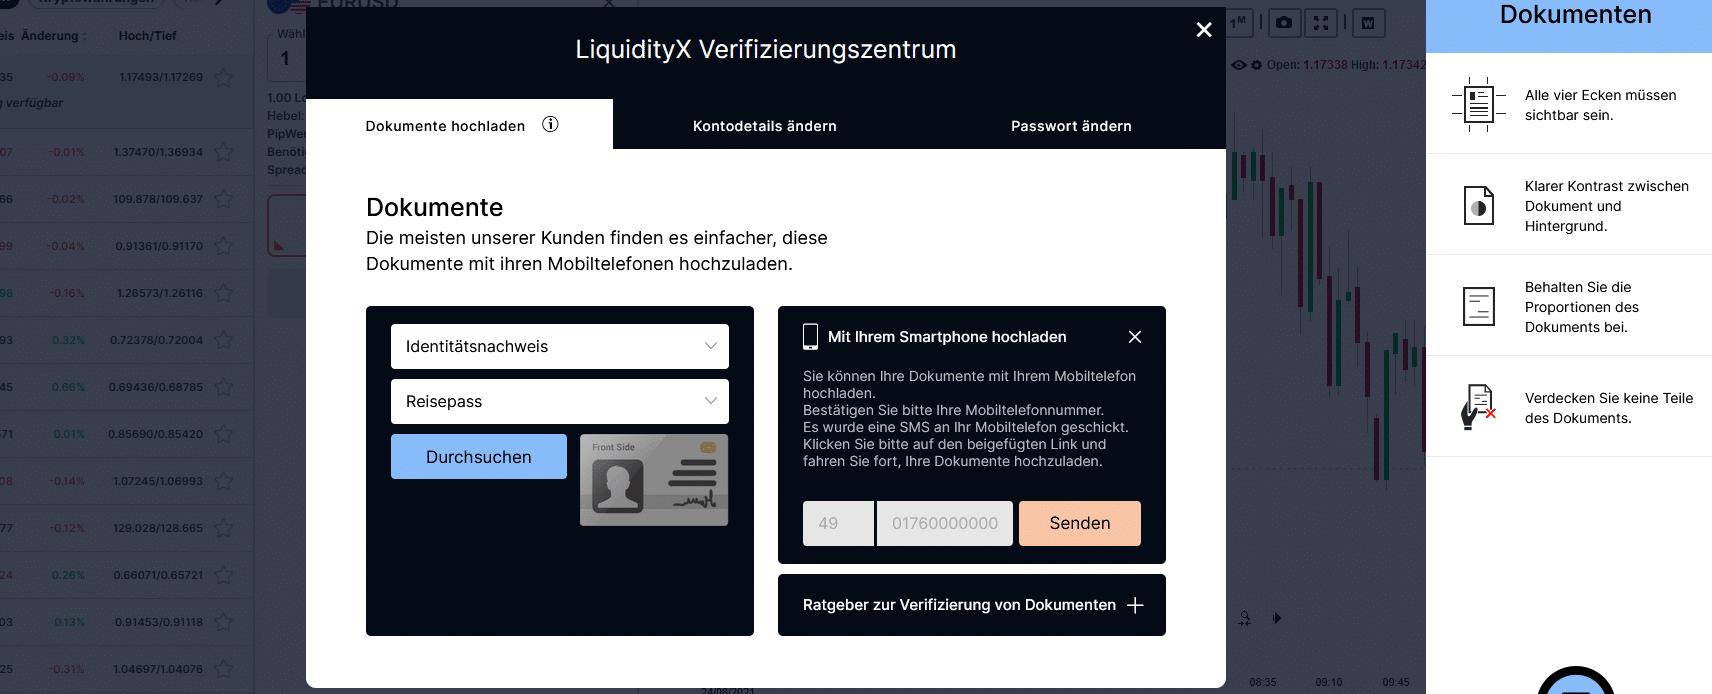 LiquidityX Verifizierung